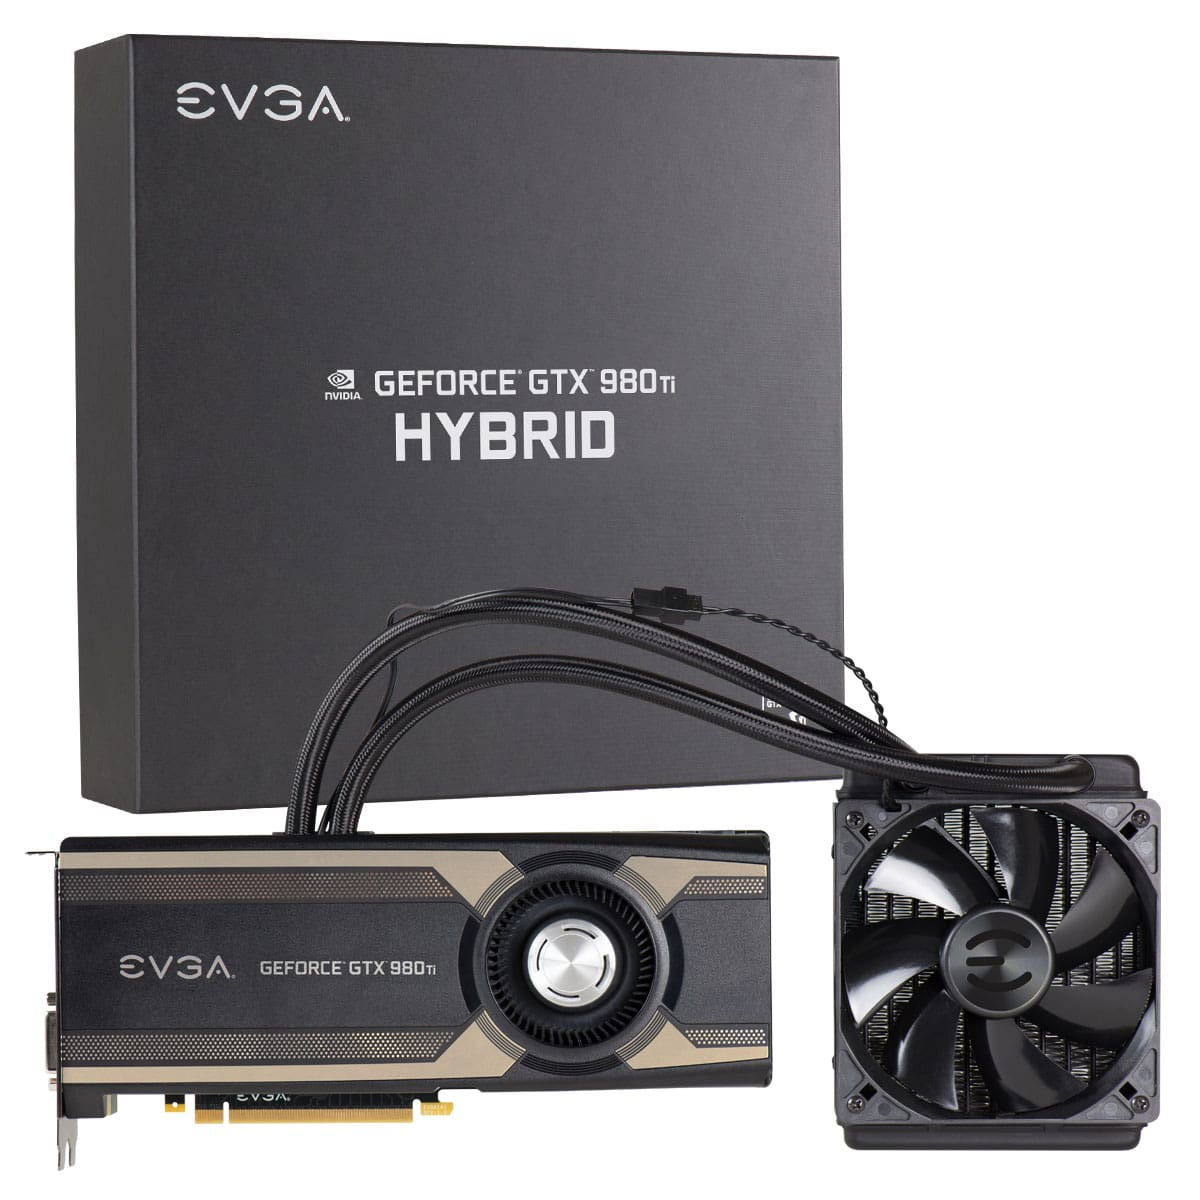 EVGA GeForce GTX 980Ti Hybrid